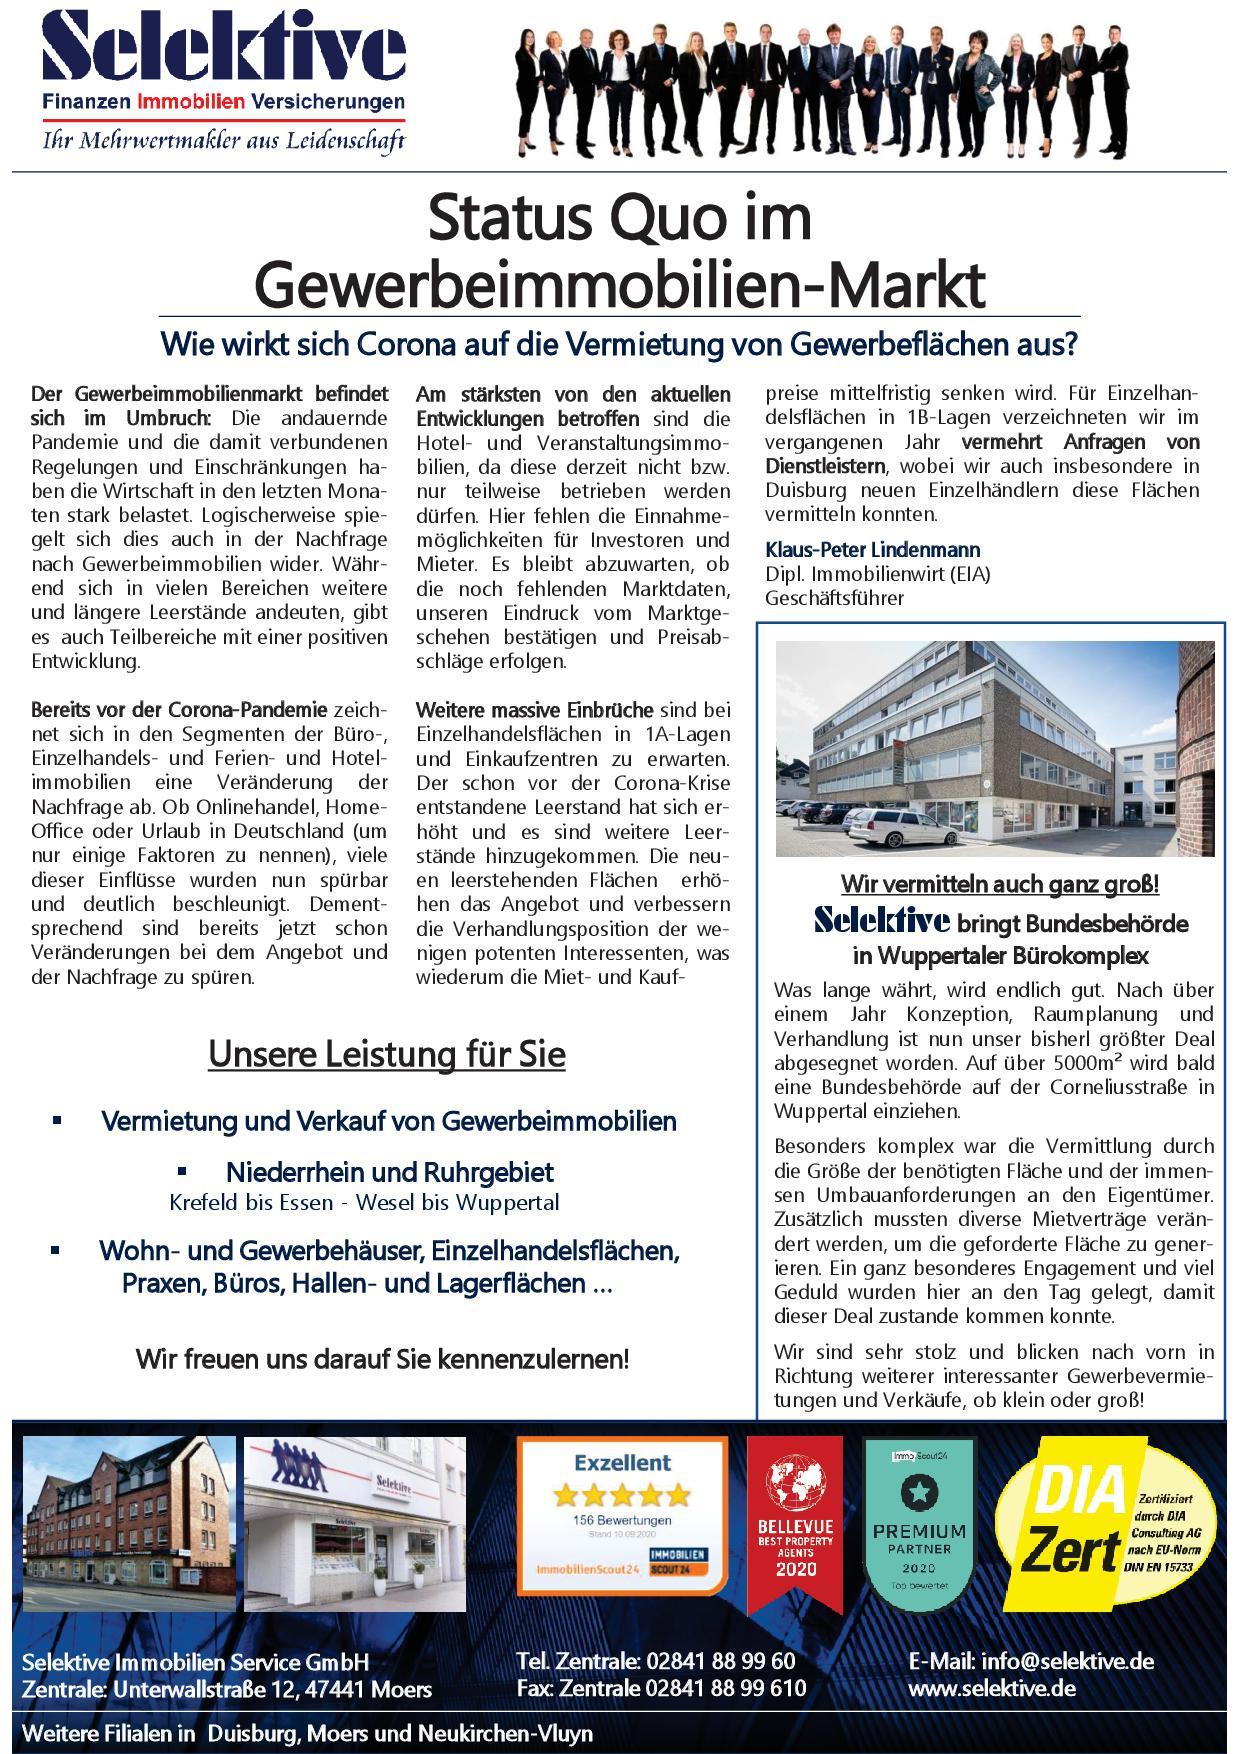 Zeitungsausschnitt zum Gewerbeimmobilienmarkt